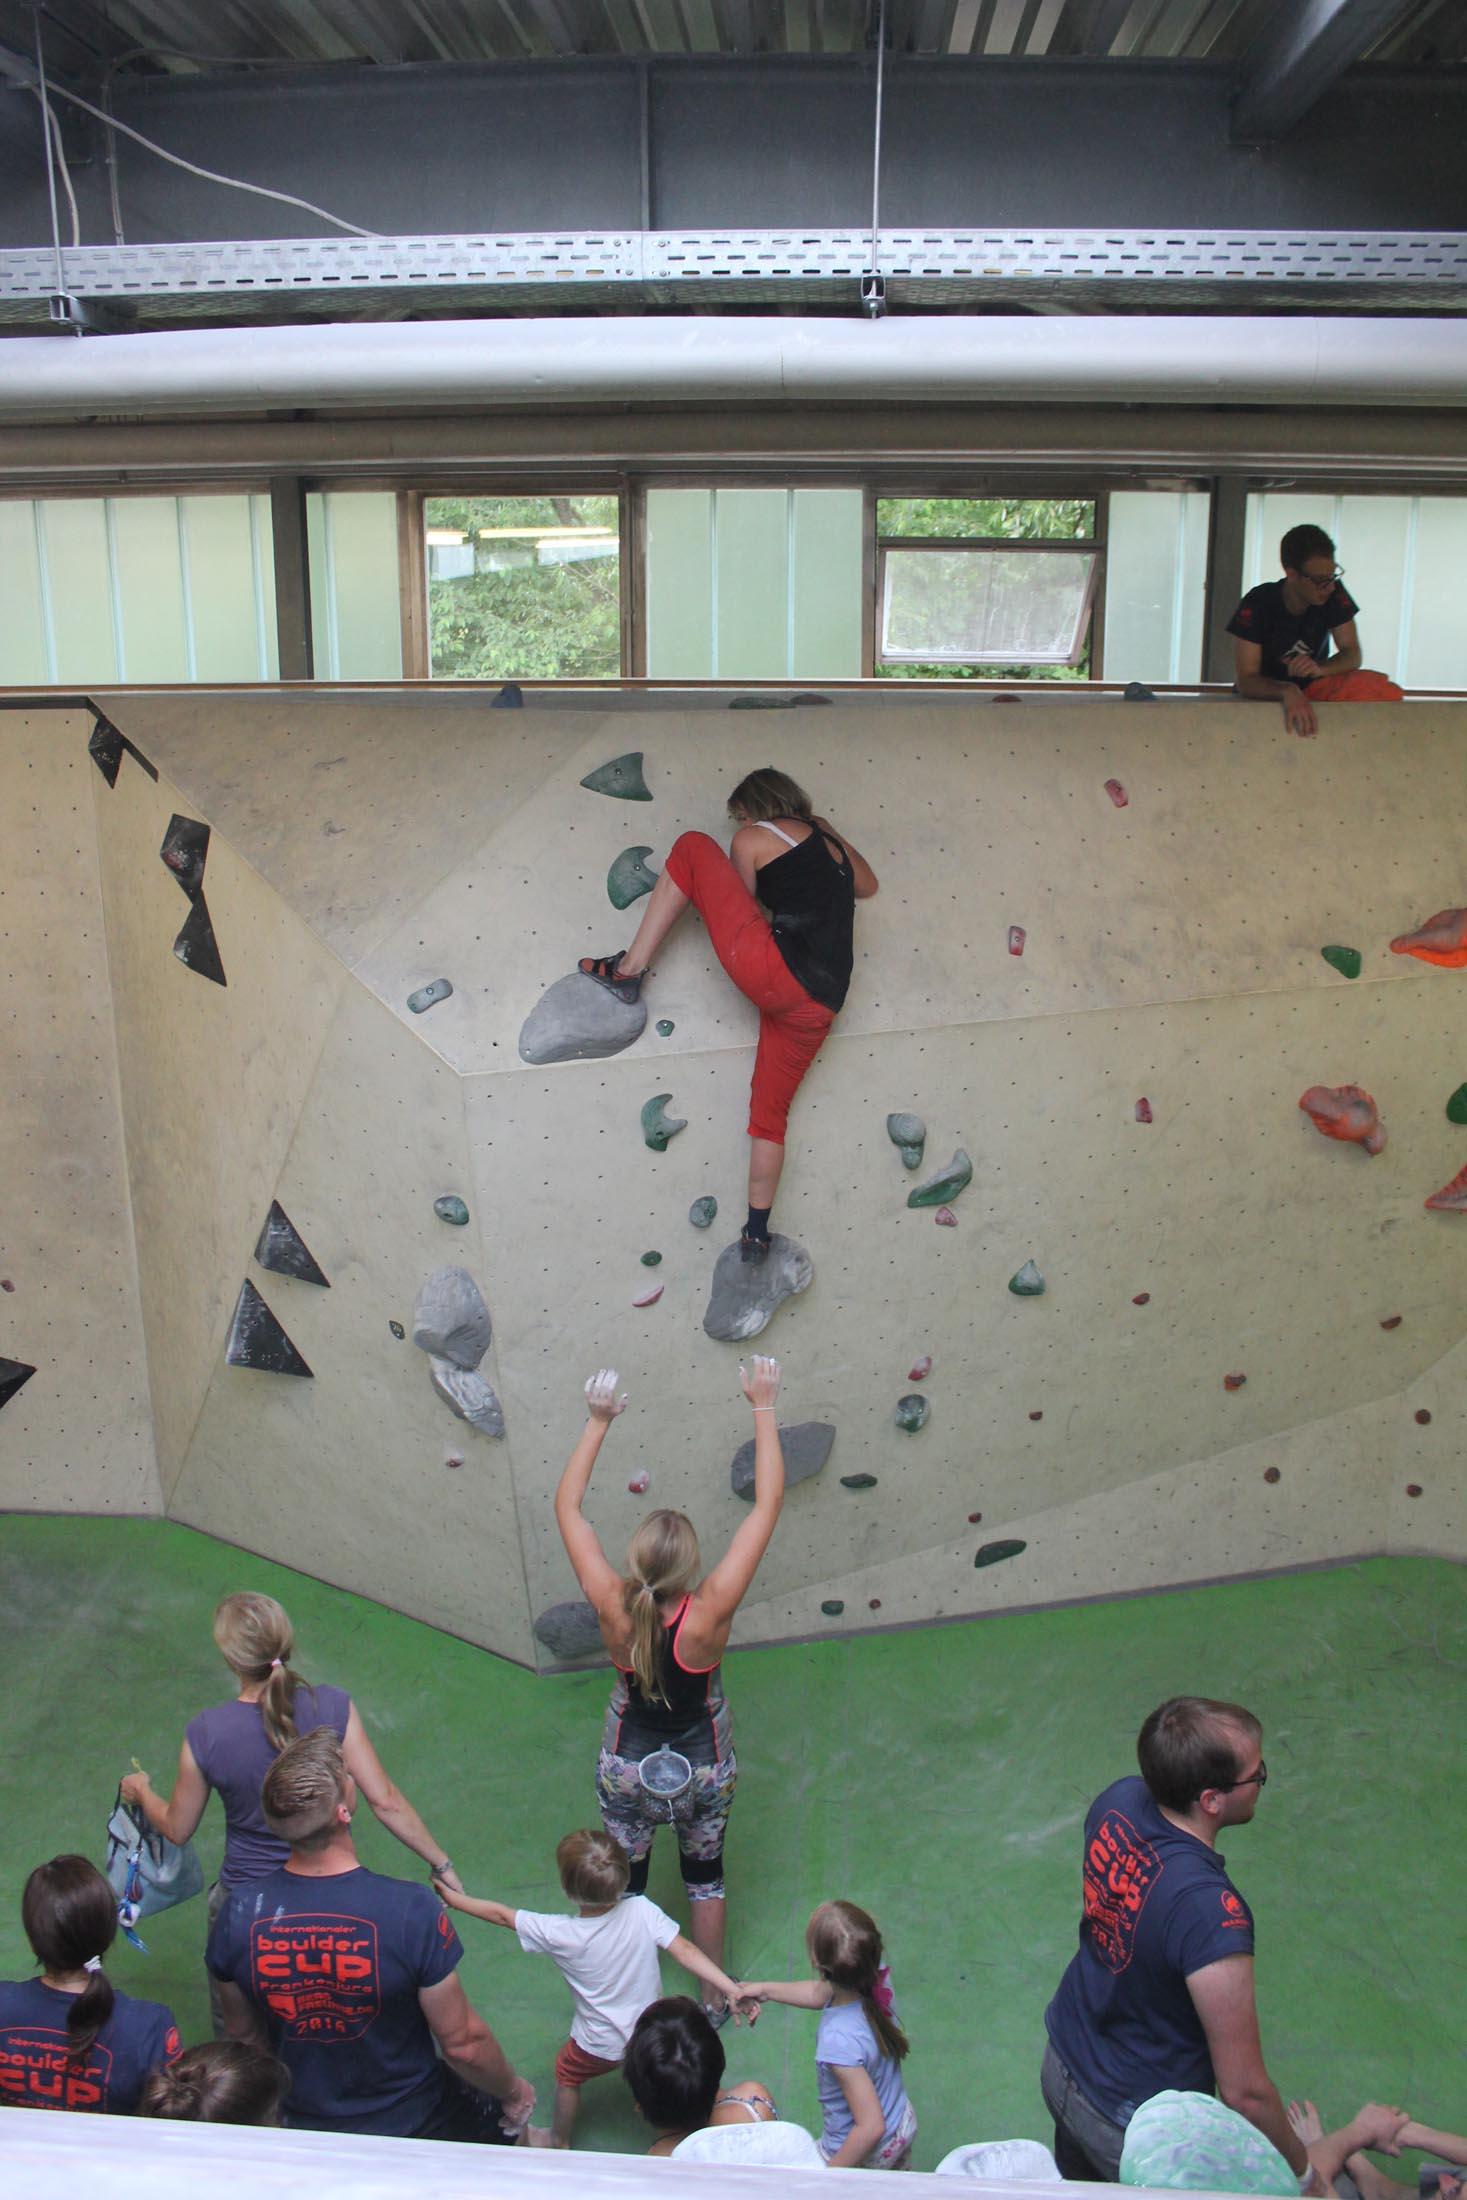 Quali, internationaler bouldercup Frankenjura 2016, BLOCKHELDEN Erlangen, Mammut, Bergfreunde.de, Boulderwettkampf07092016298